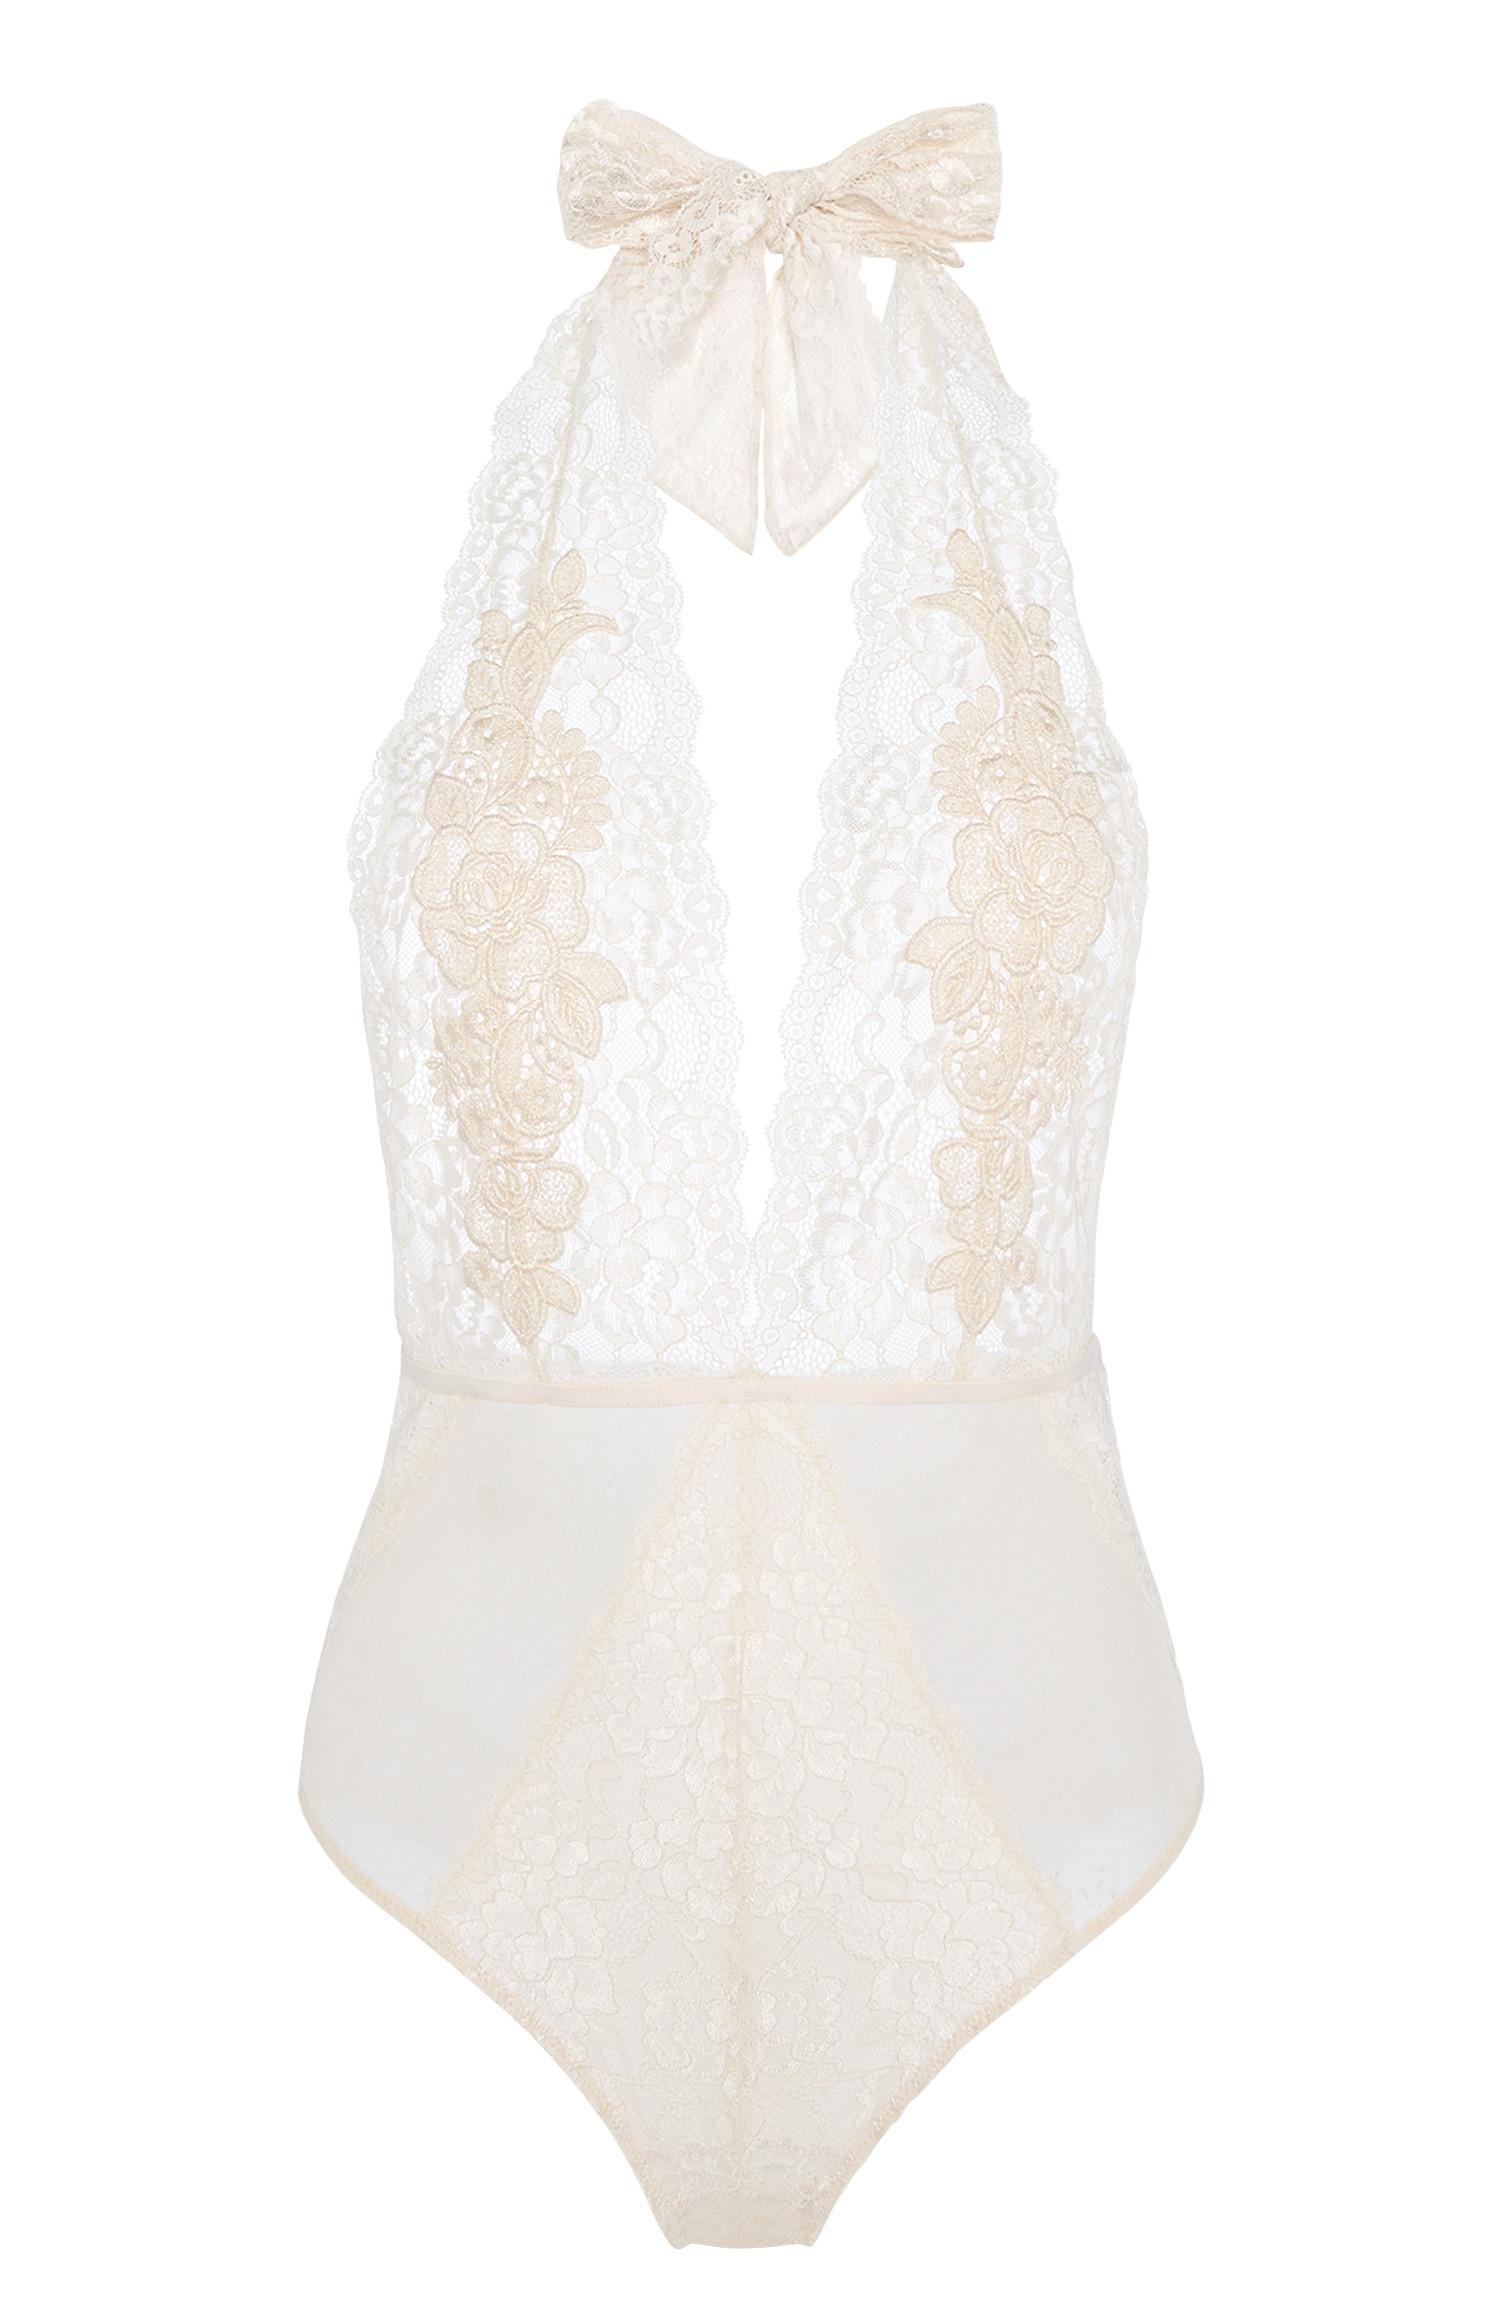 Champagne Lace Bodysuit